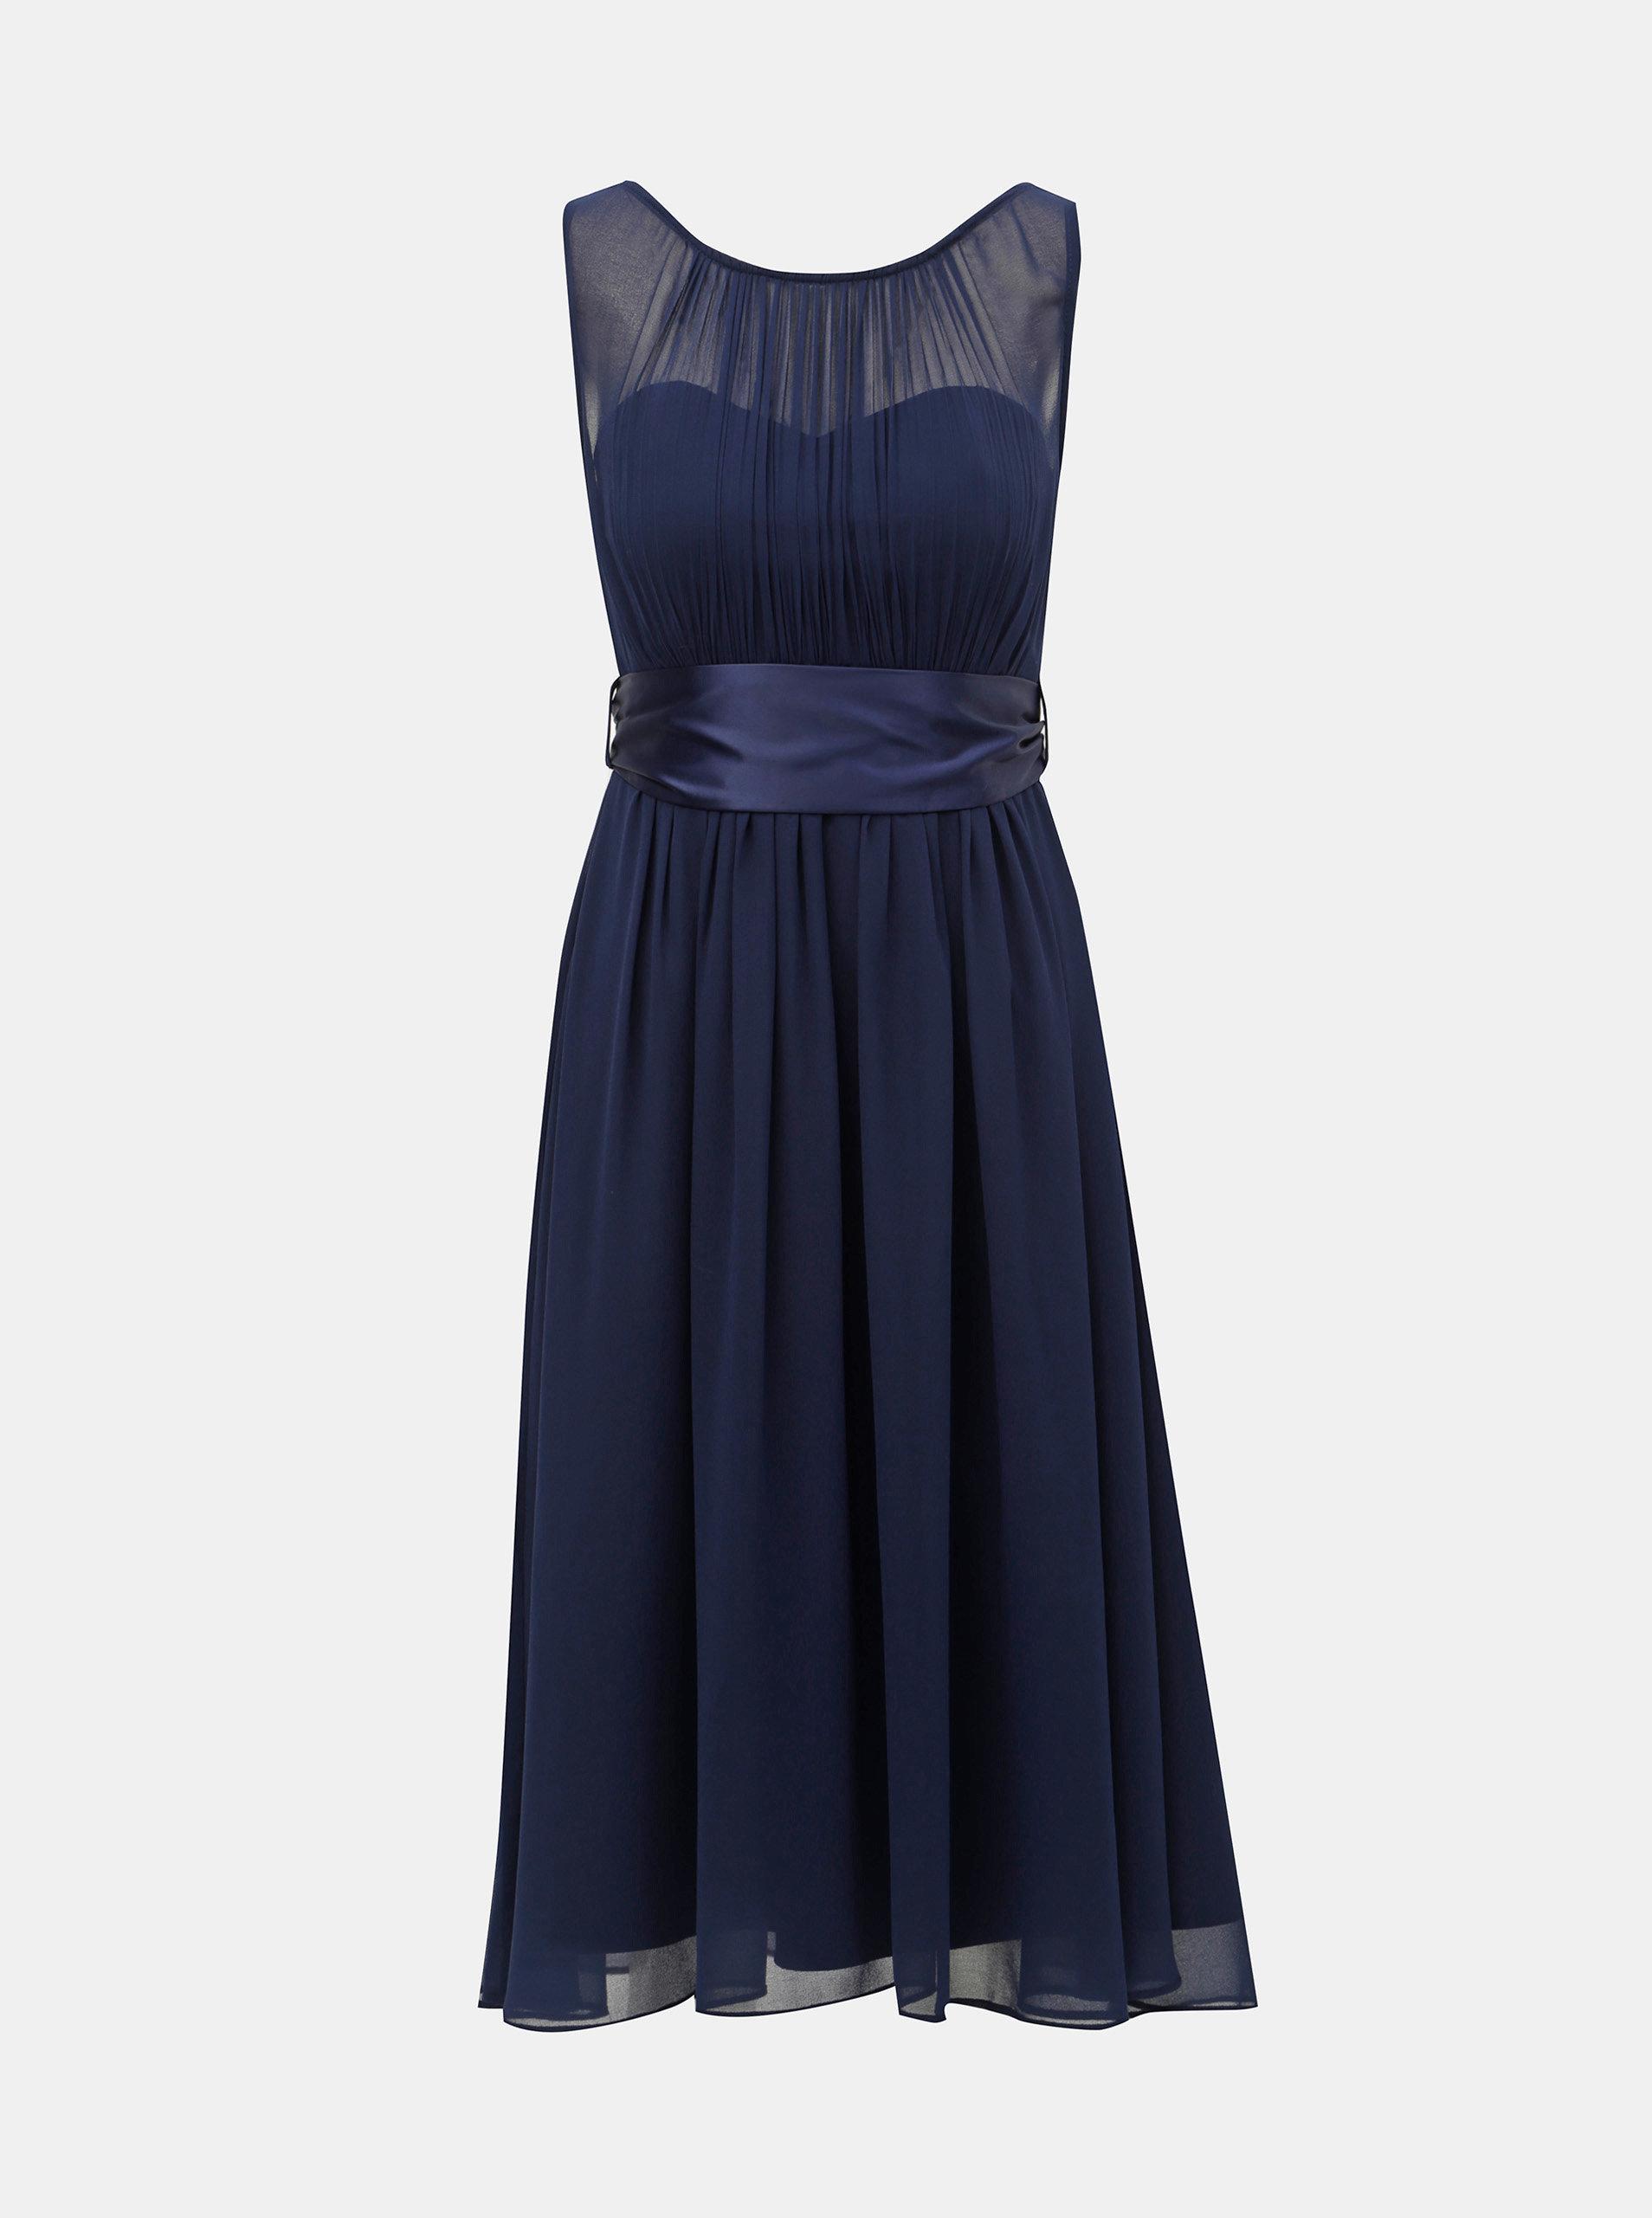 09c54759e6 Tmavomodré šaty Dorothy Perkins ...